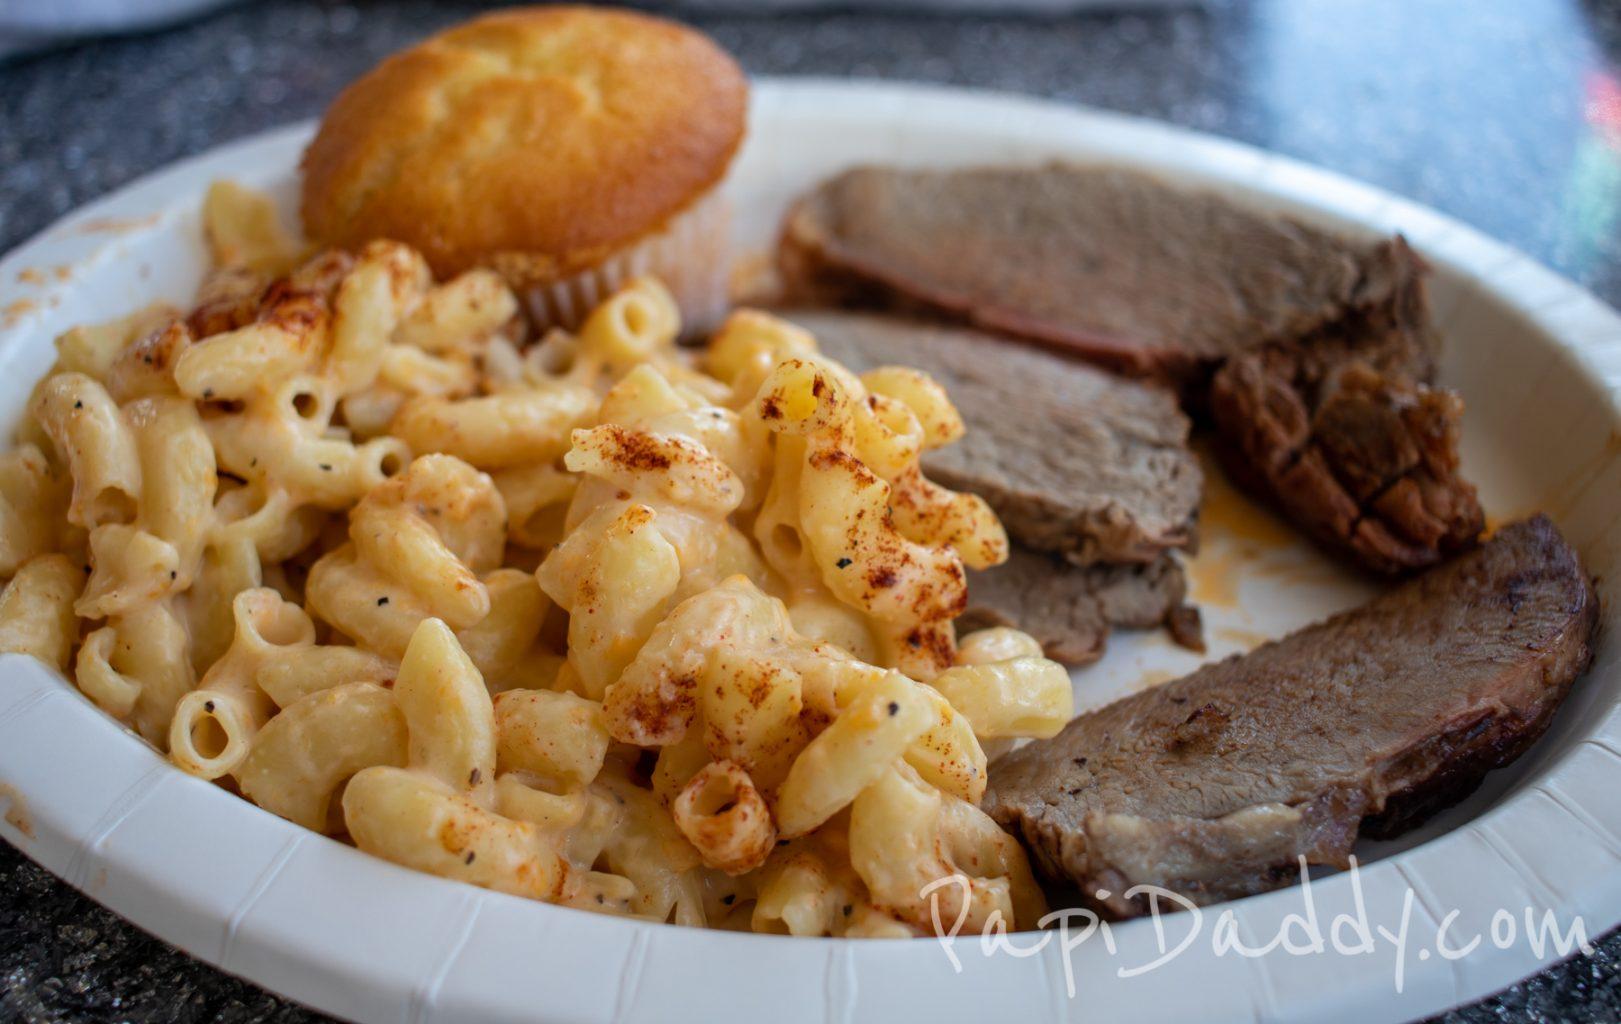 Boardwalk BBQ Knott's Berry Farm, brisket with mac & cheese.